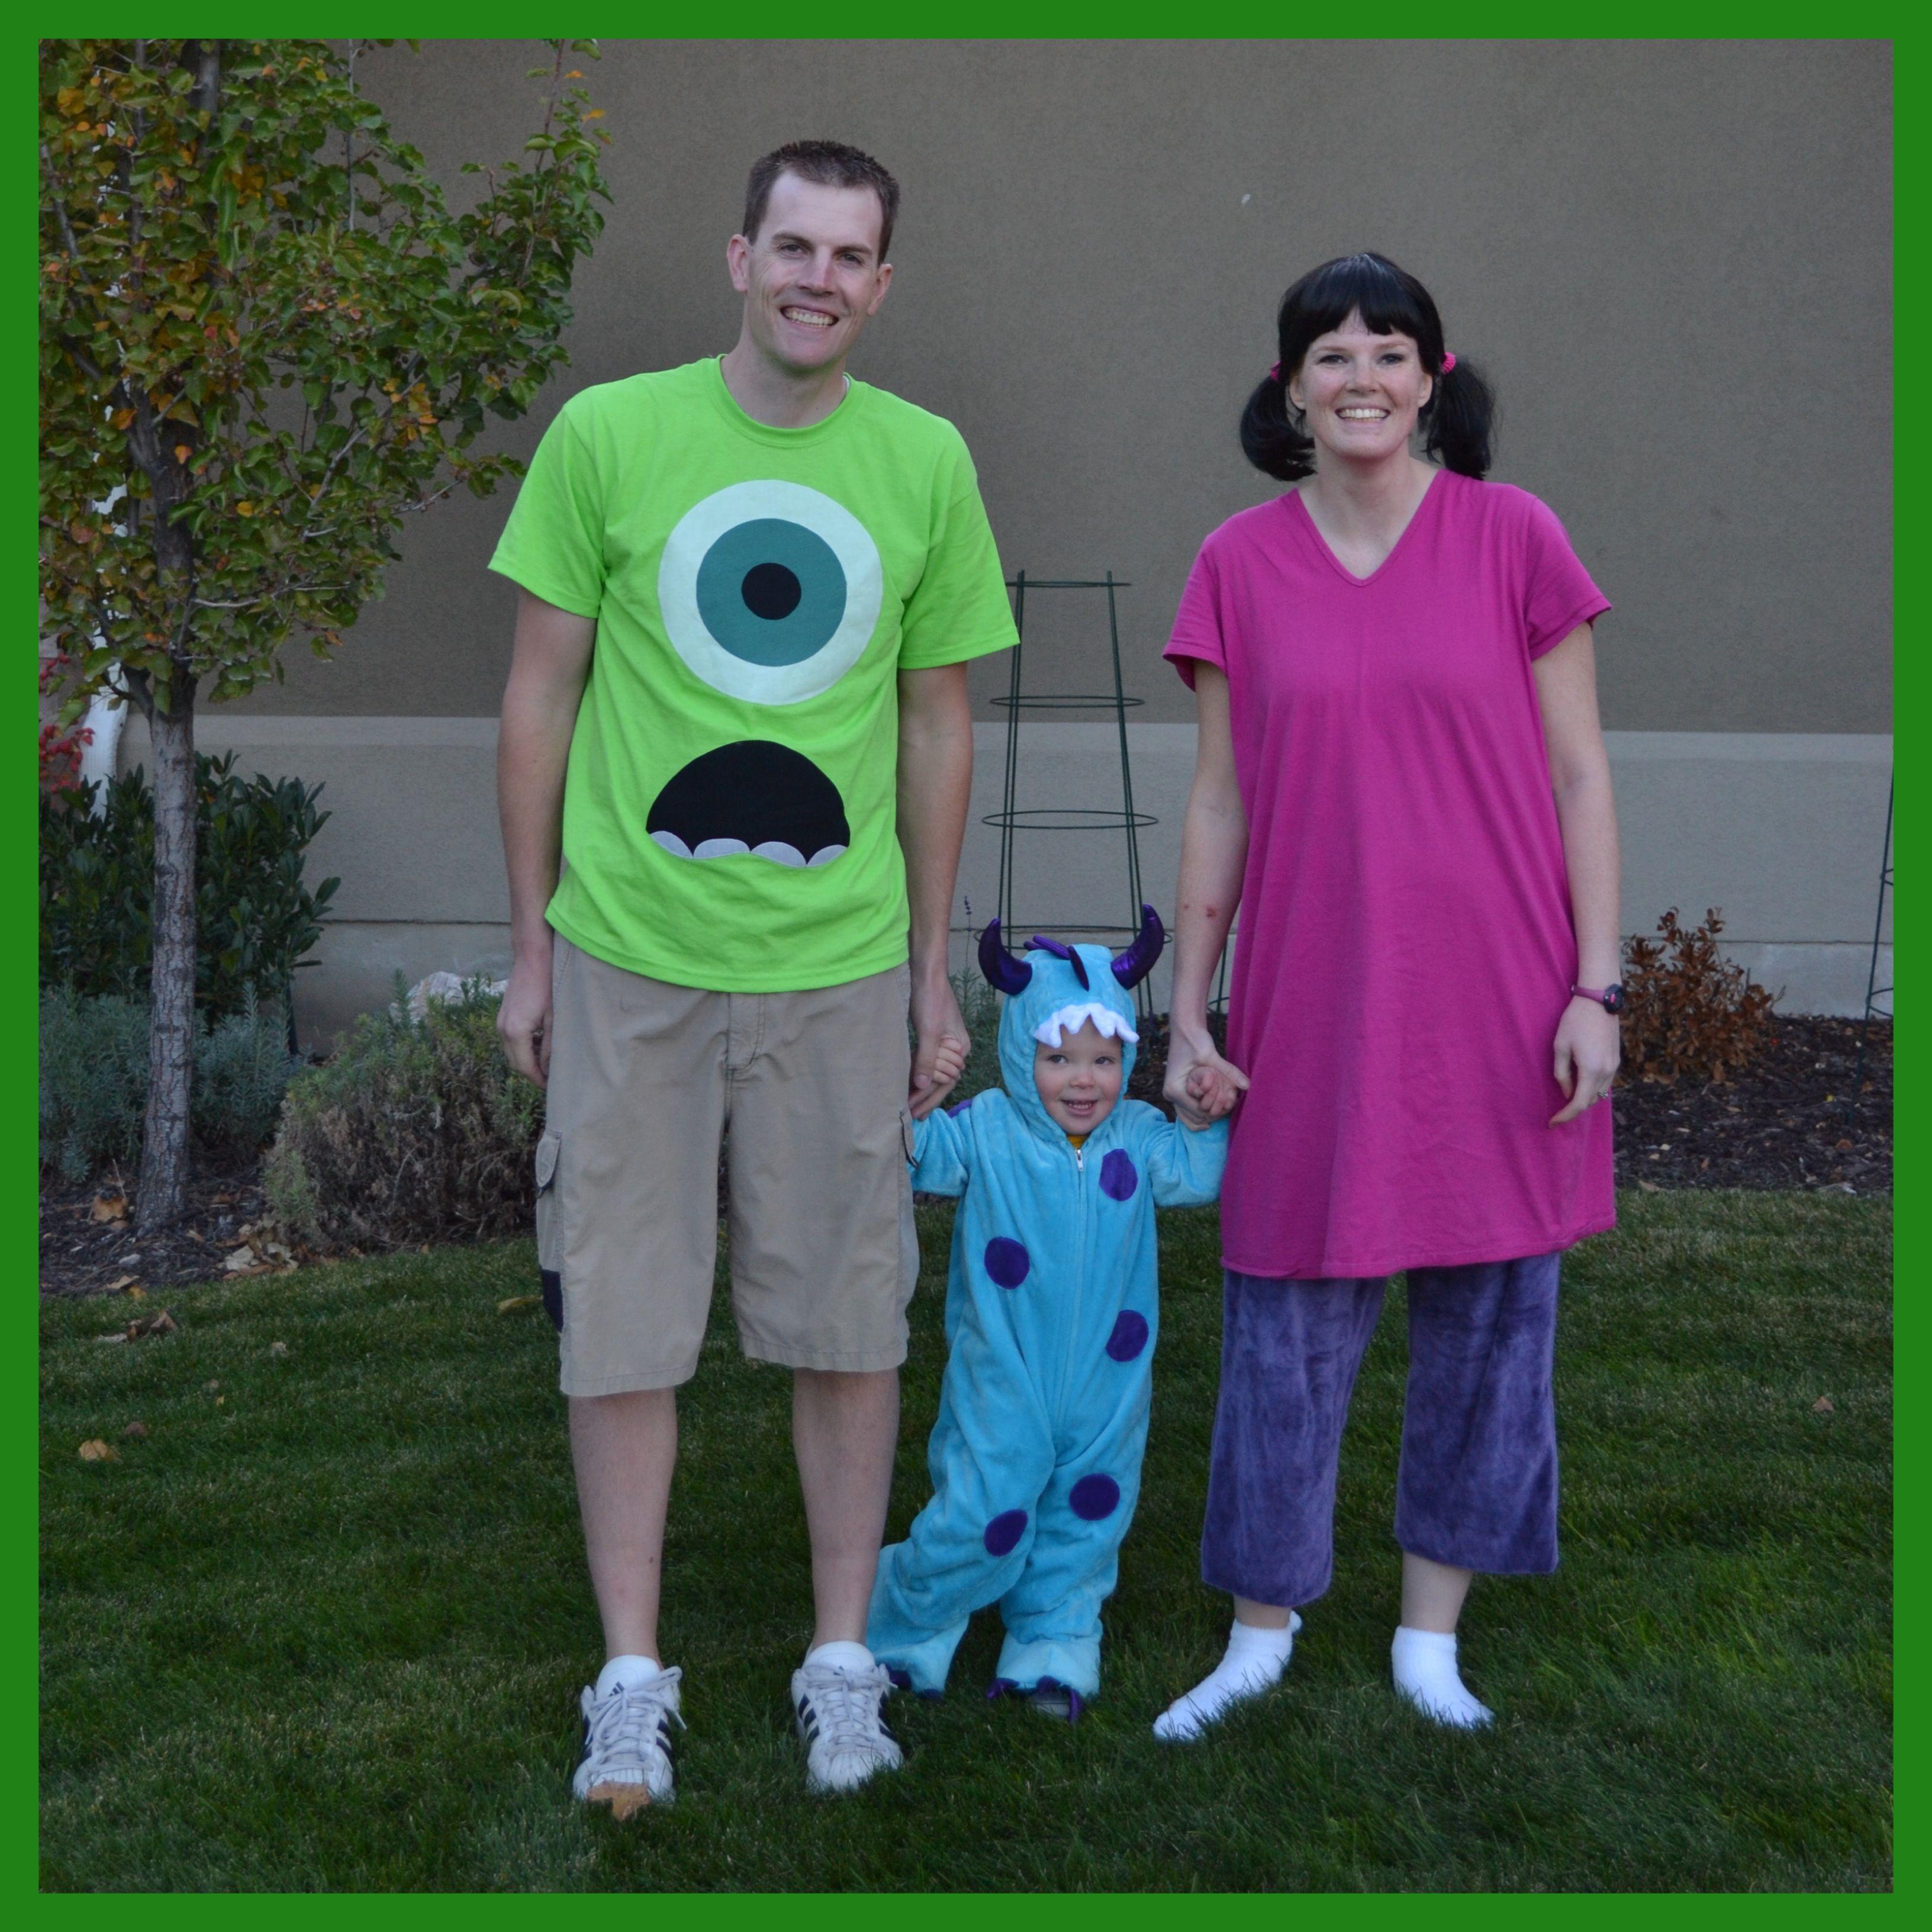 Monsters Inc Family Halloween Costumes Mike Wazowski Sulley Boo Boo Halloween Costume Pumpkin Halloween Costume Mike Wazowski Costume